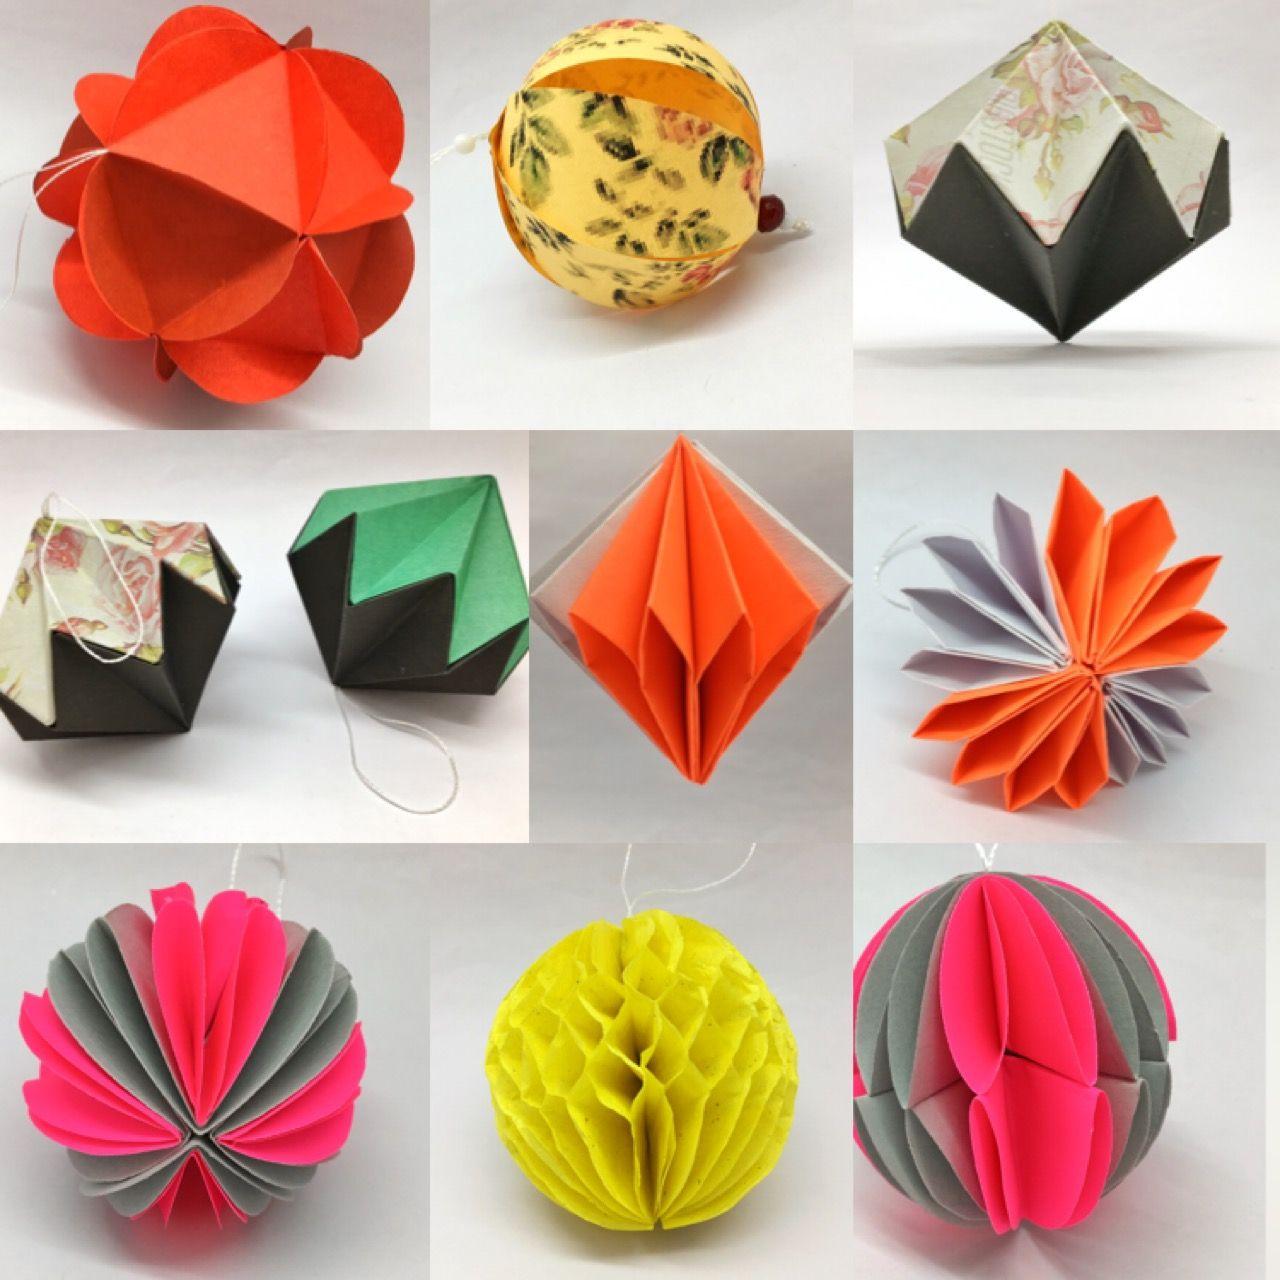 3d Paper Ornaments Paper Ornaments Paper Ornaments Diy Paper Art Craft